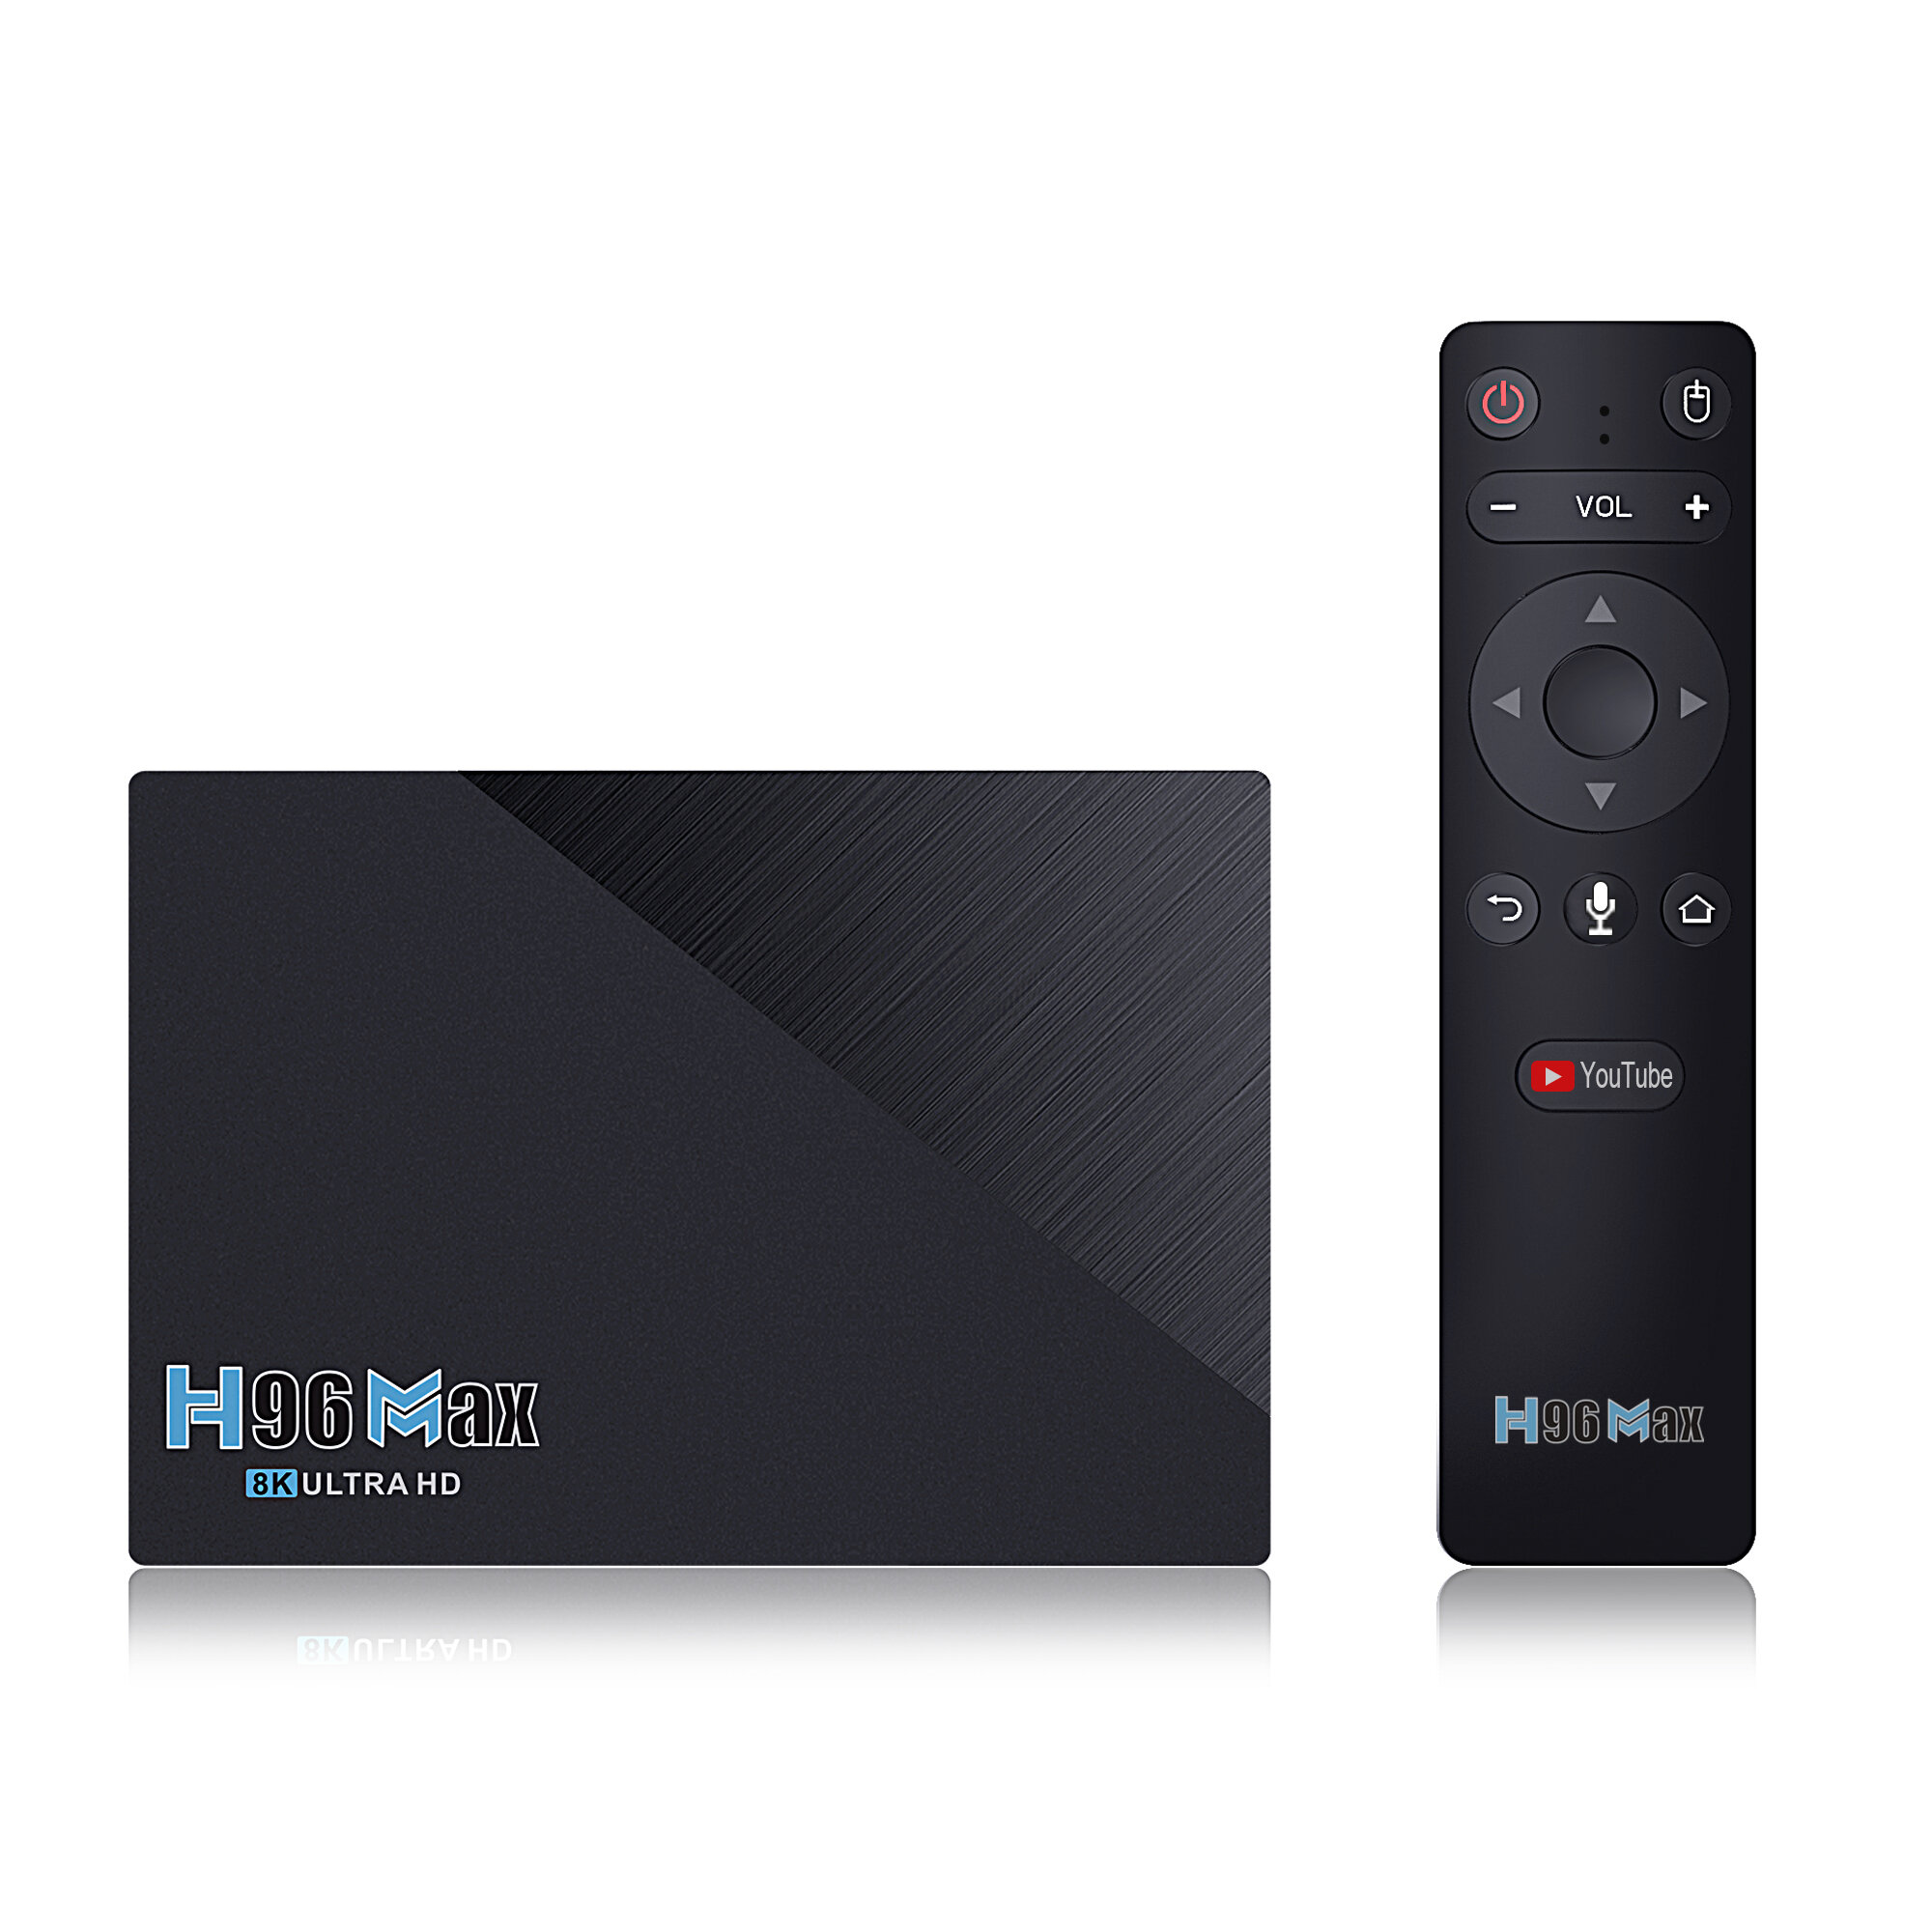 Banggood coupon: H96 MAX RK3566 SDRAM 8GB DDR3 64GB eMMC ROM Android 11.0 8K UHD TV Caixa bluetooth 4.0 5G Wifi 1000M LAN H.265 VP9 Decod